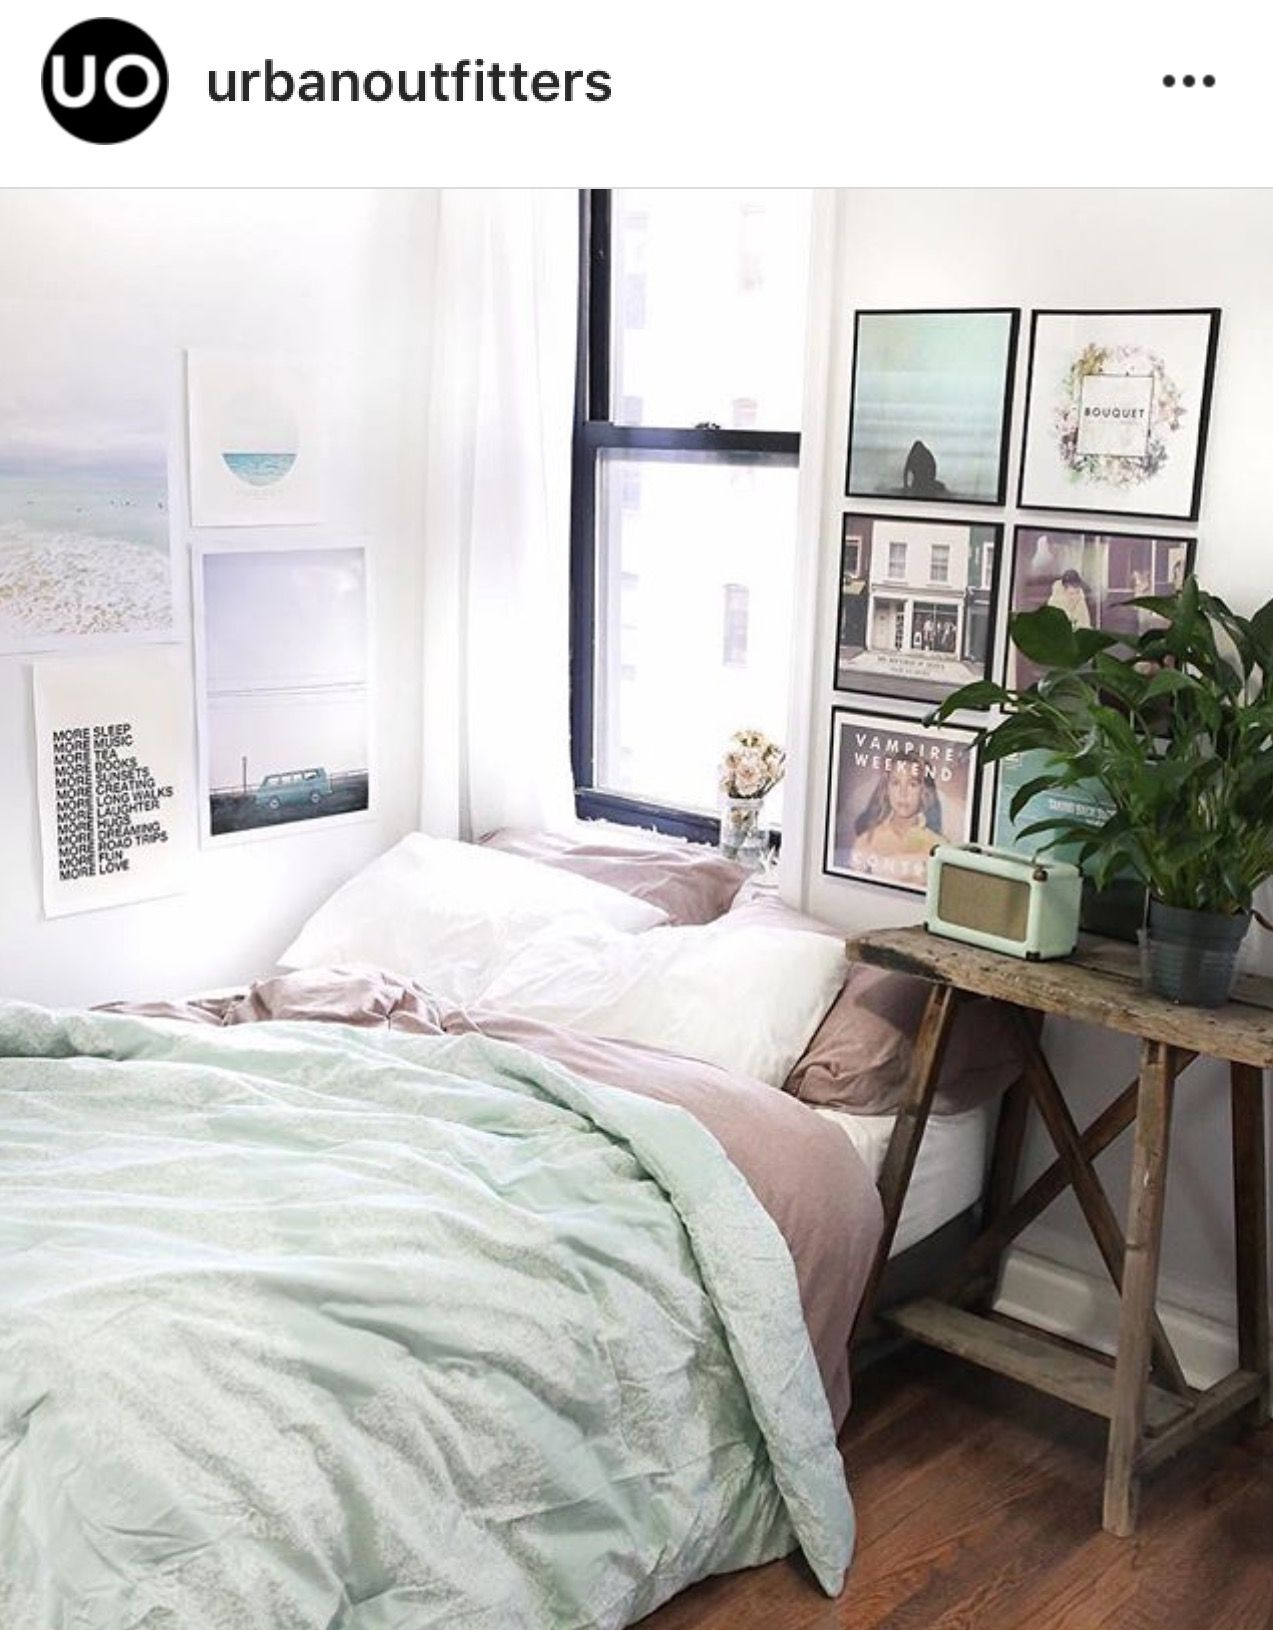 Ethnic bedroom design gallery colors  pictures  wall decor  duvet  bedroom  minimalist decor